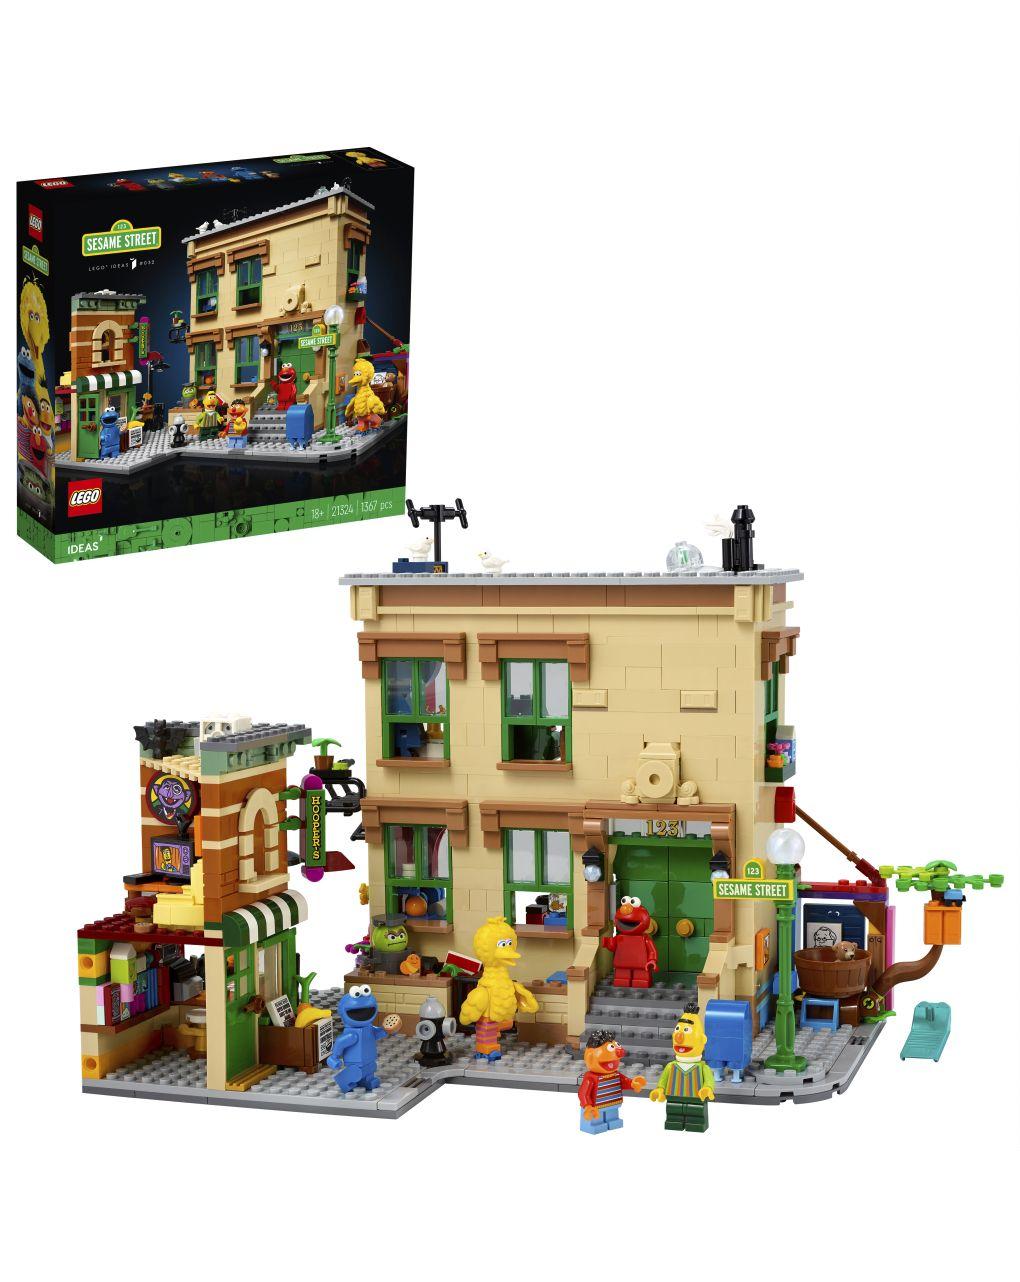 Lego ideas - 123 sesame street - 21324 - LEGO